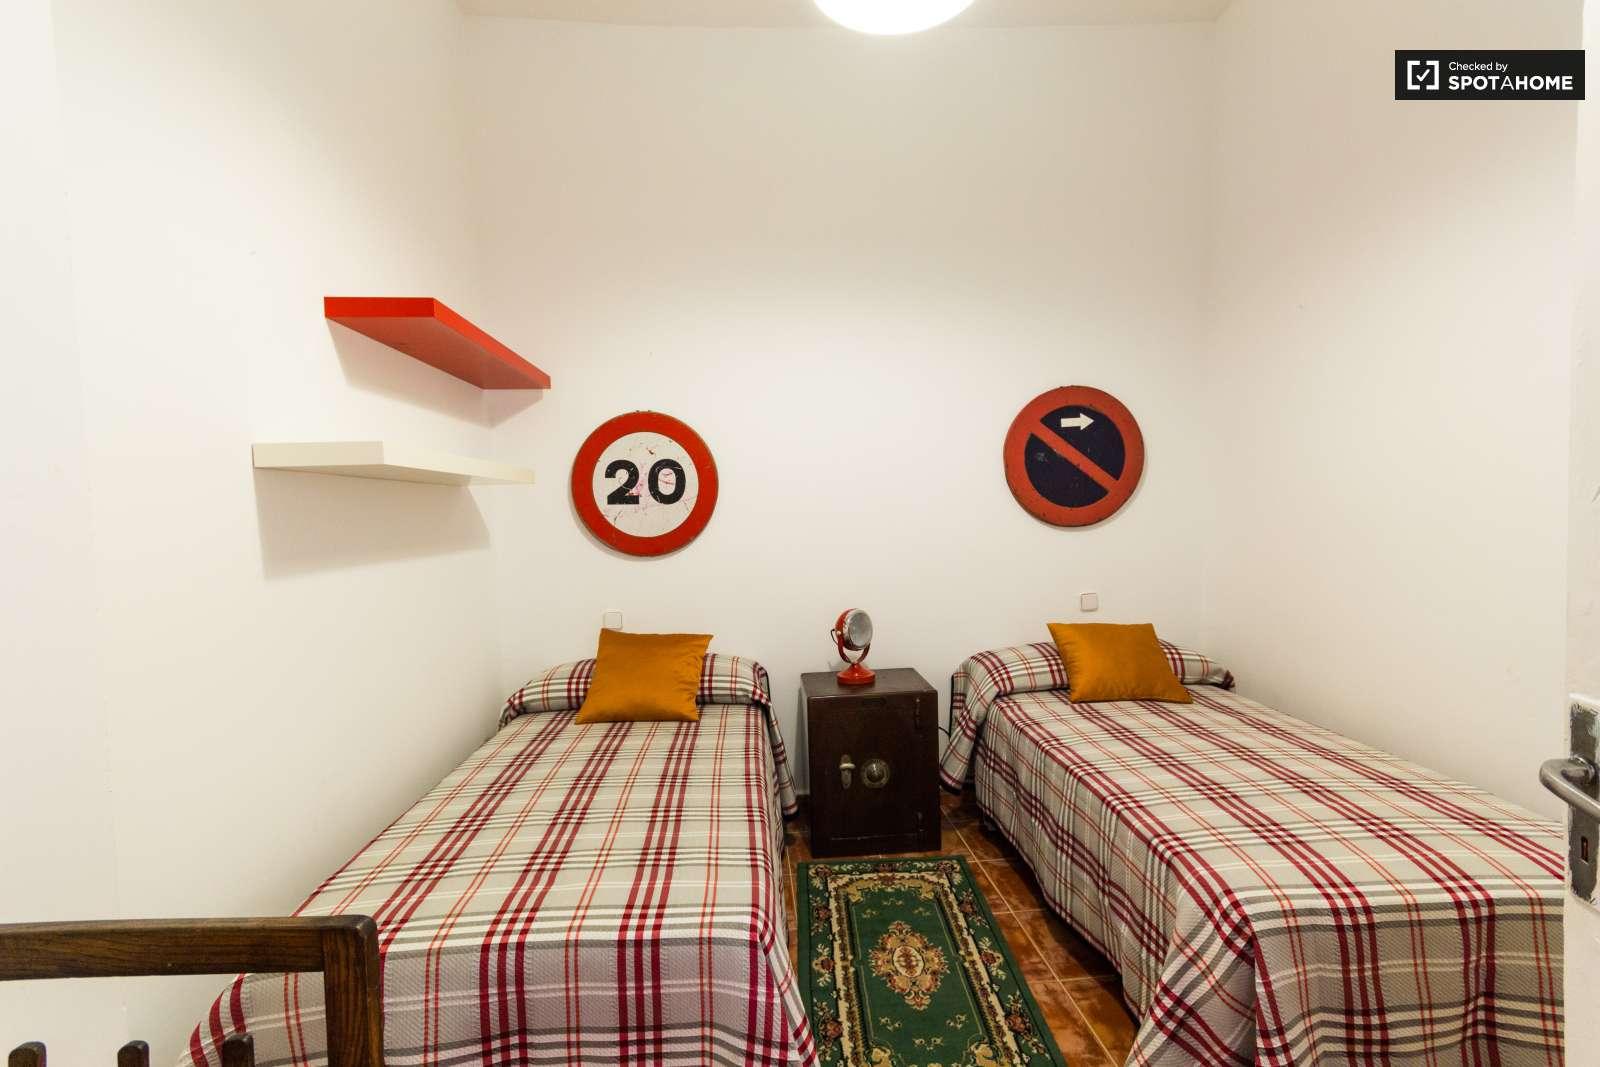 3 bedroom apartment for rent in puerta del sol, madrid   spotahome